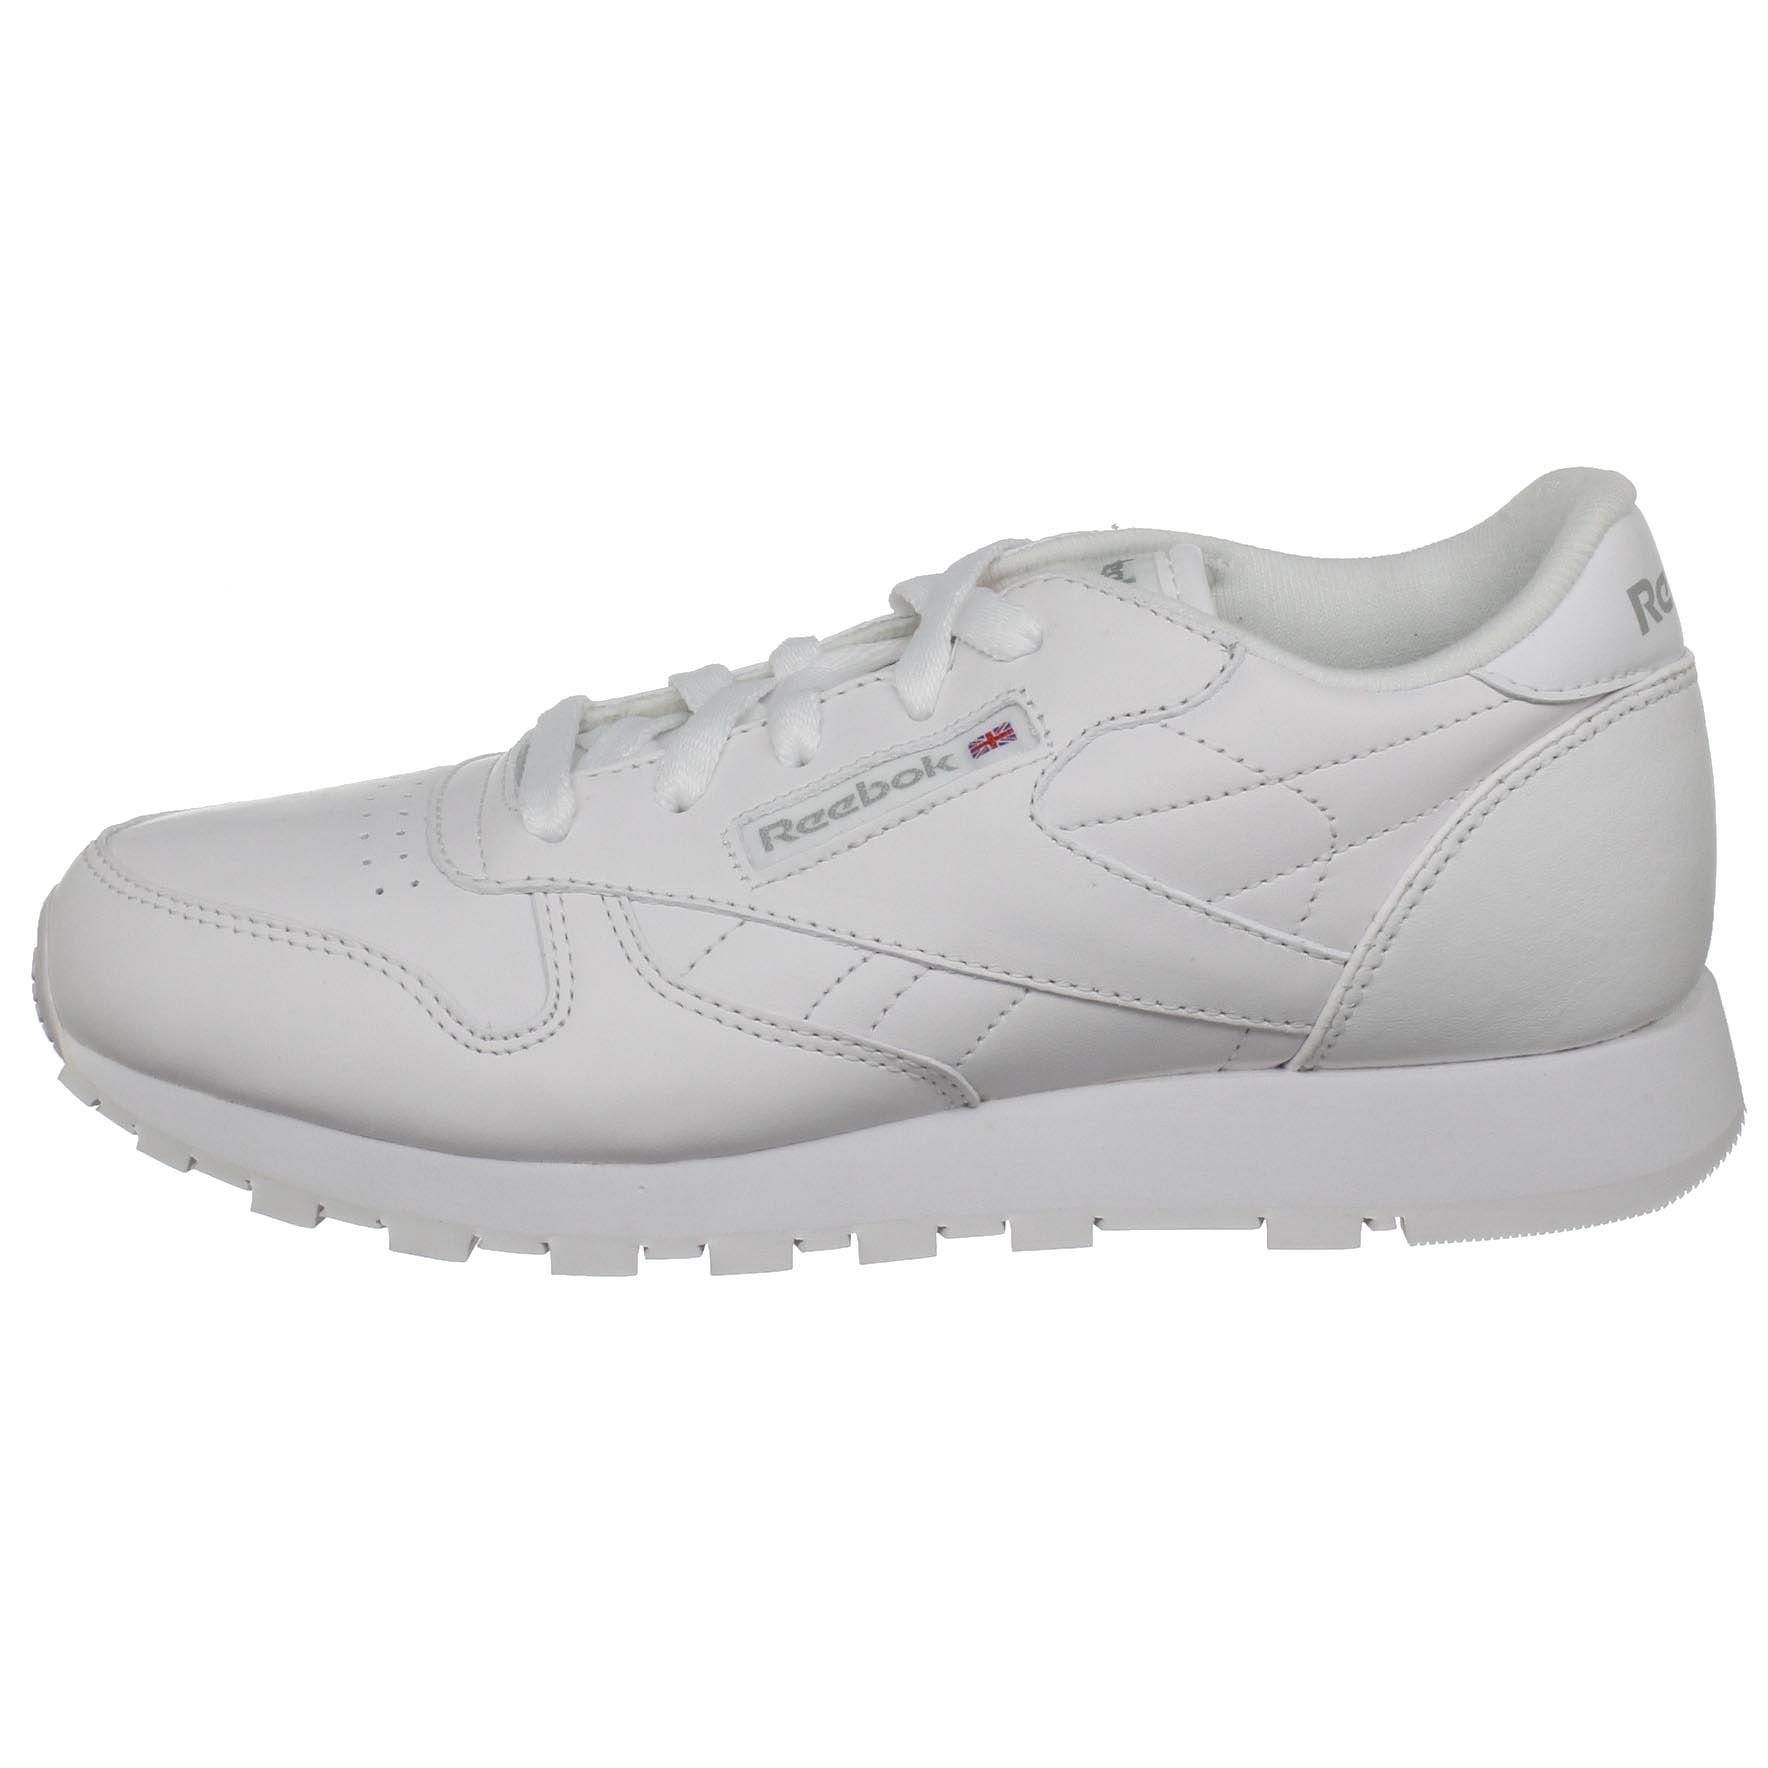 518bd4c0cf0 Reebok - Reebok 50150  Classic Leather Big Kid White White Sneaker (7 M US  Big Kid) - Walmart.com